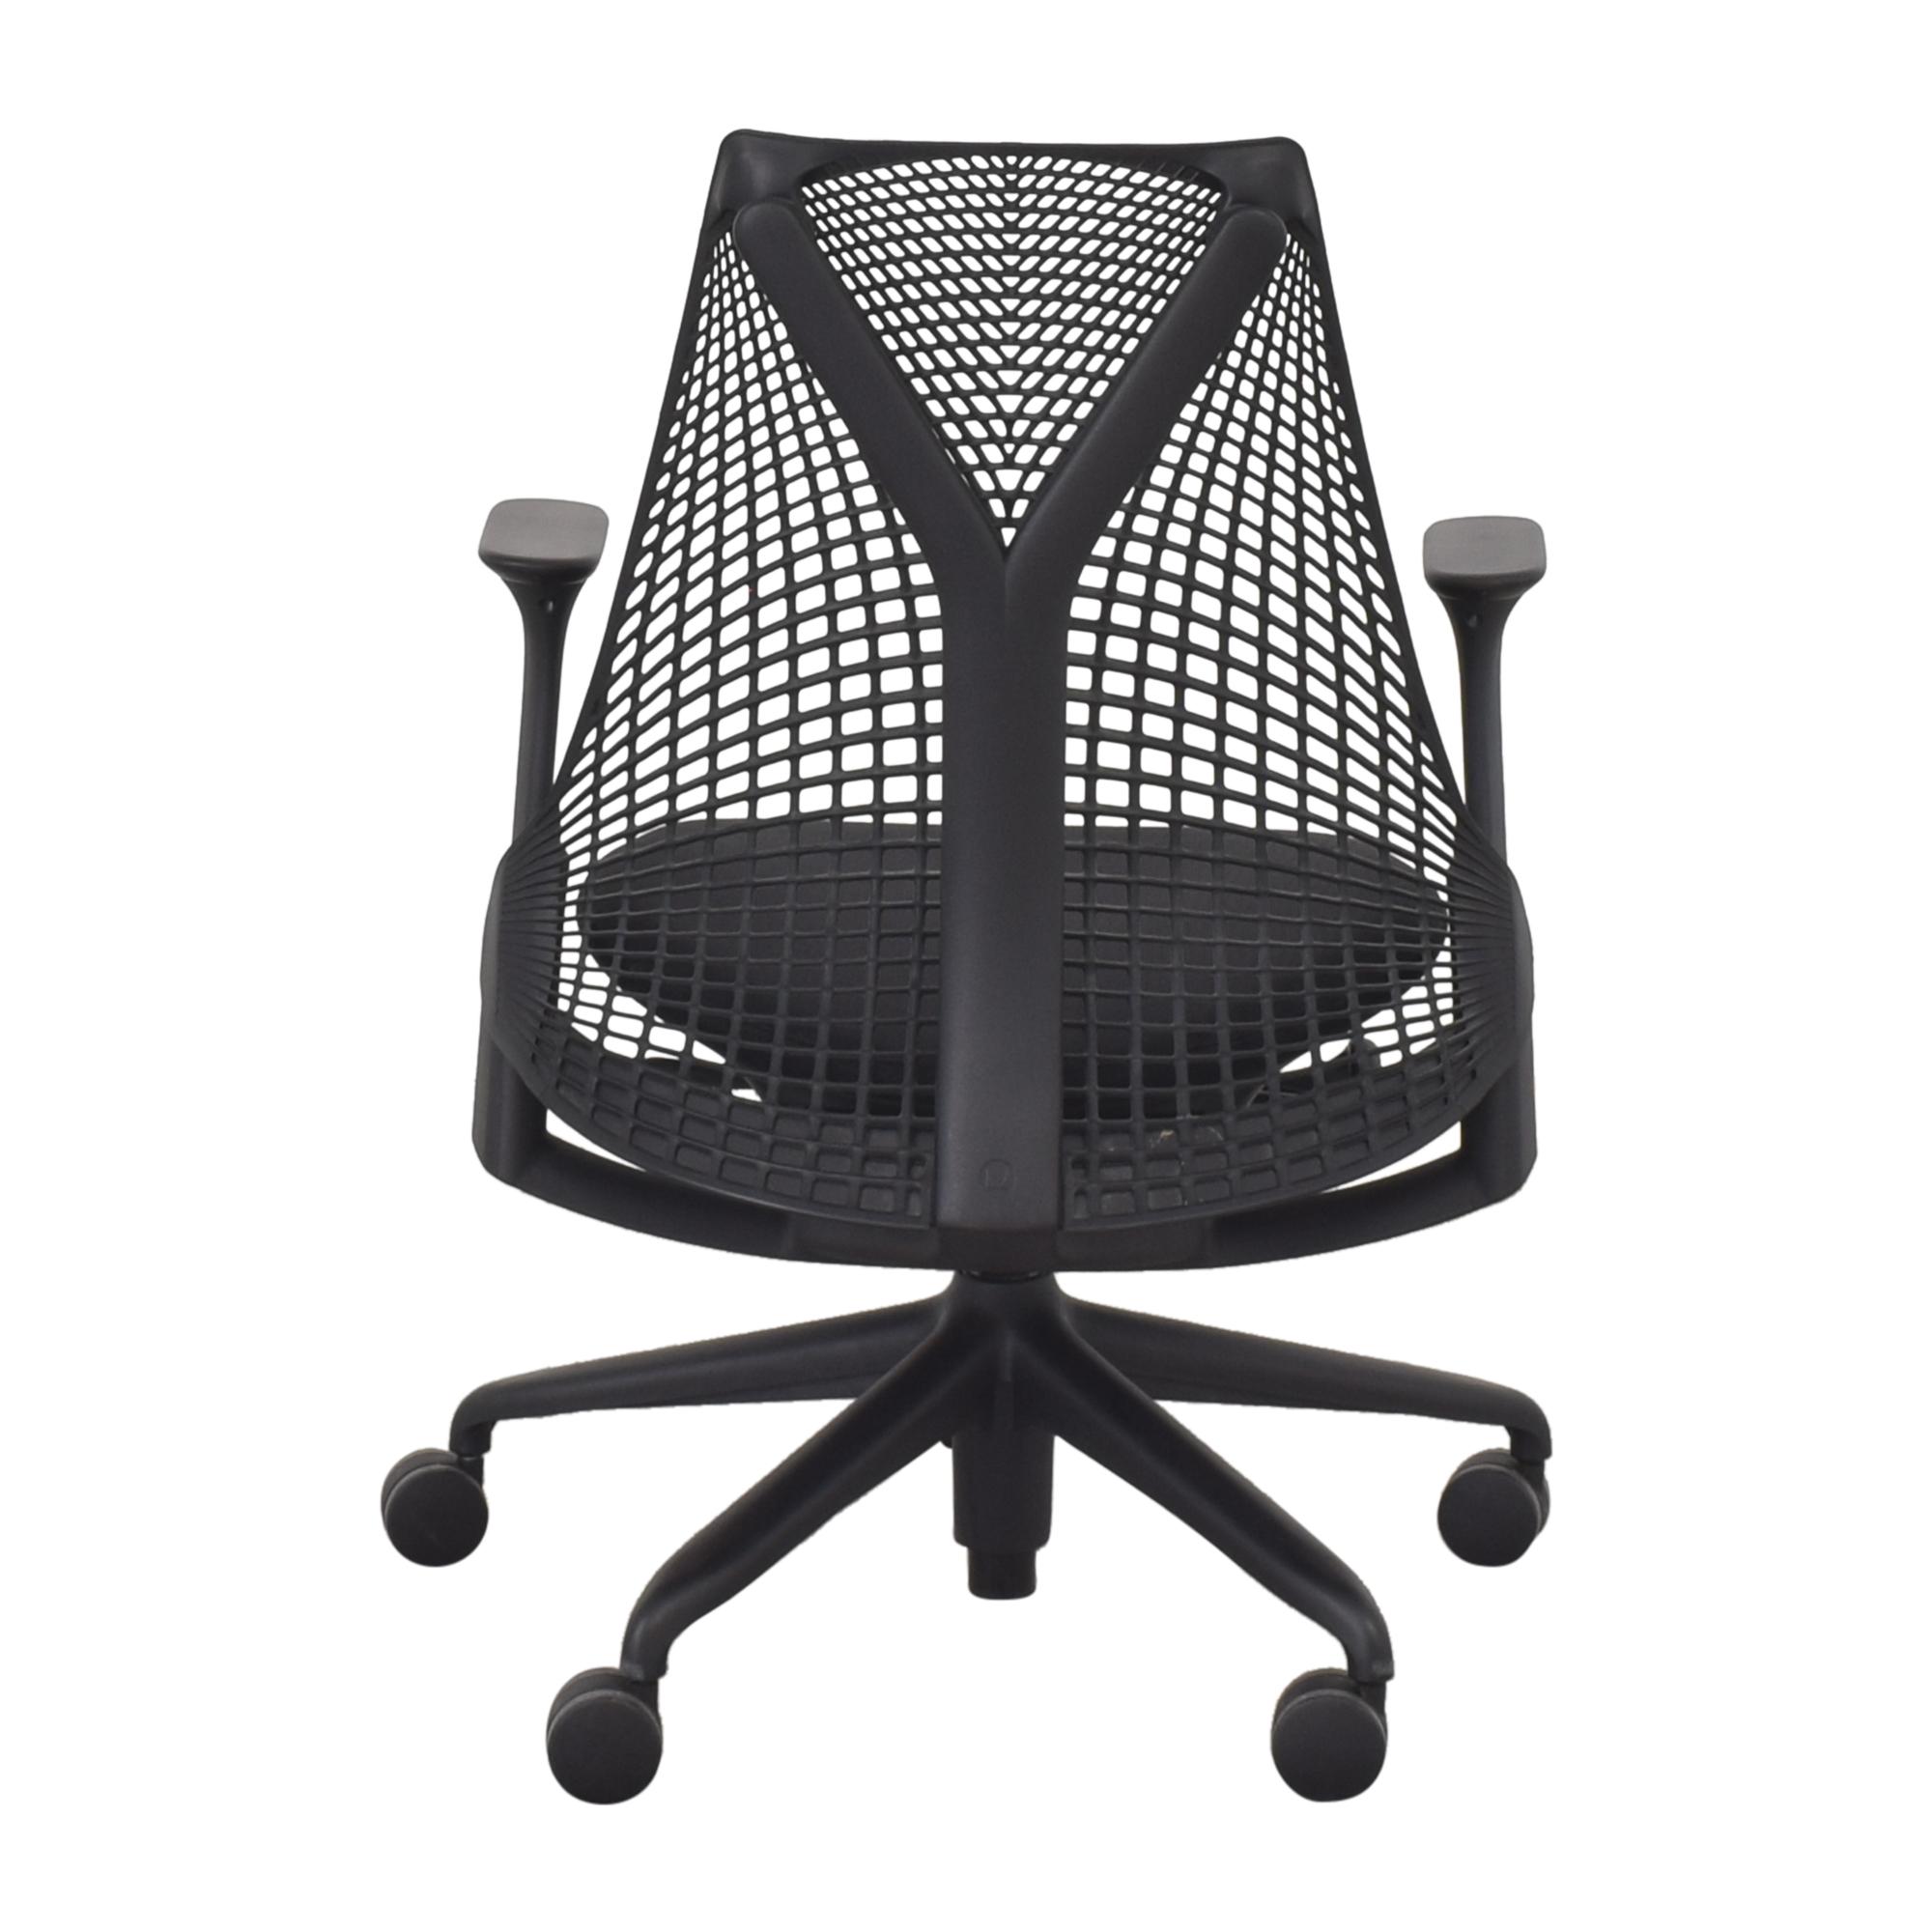 Herman Miller Herman Miller Sayl Chair ct